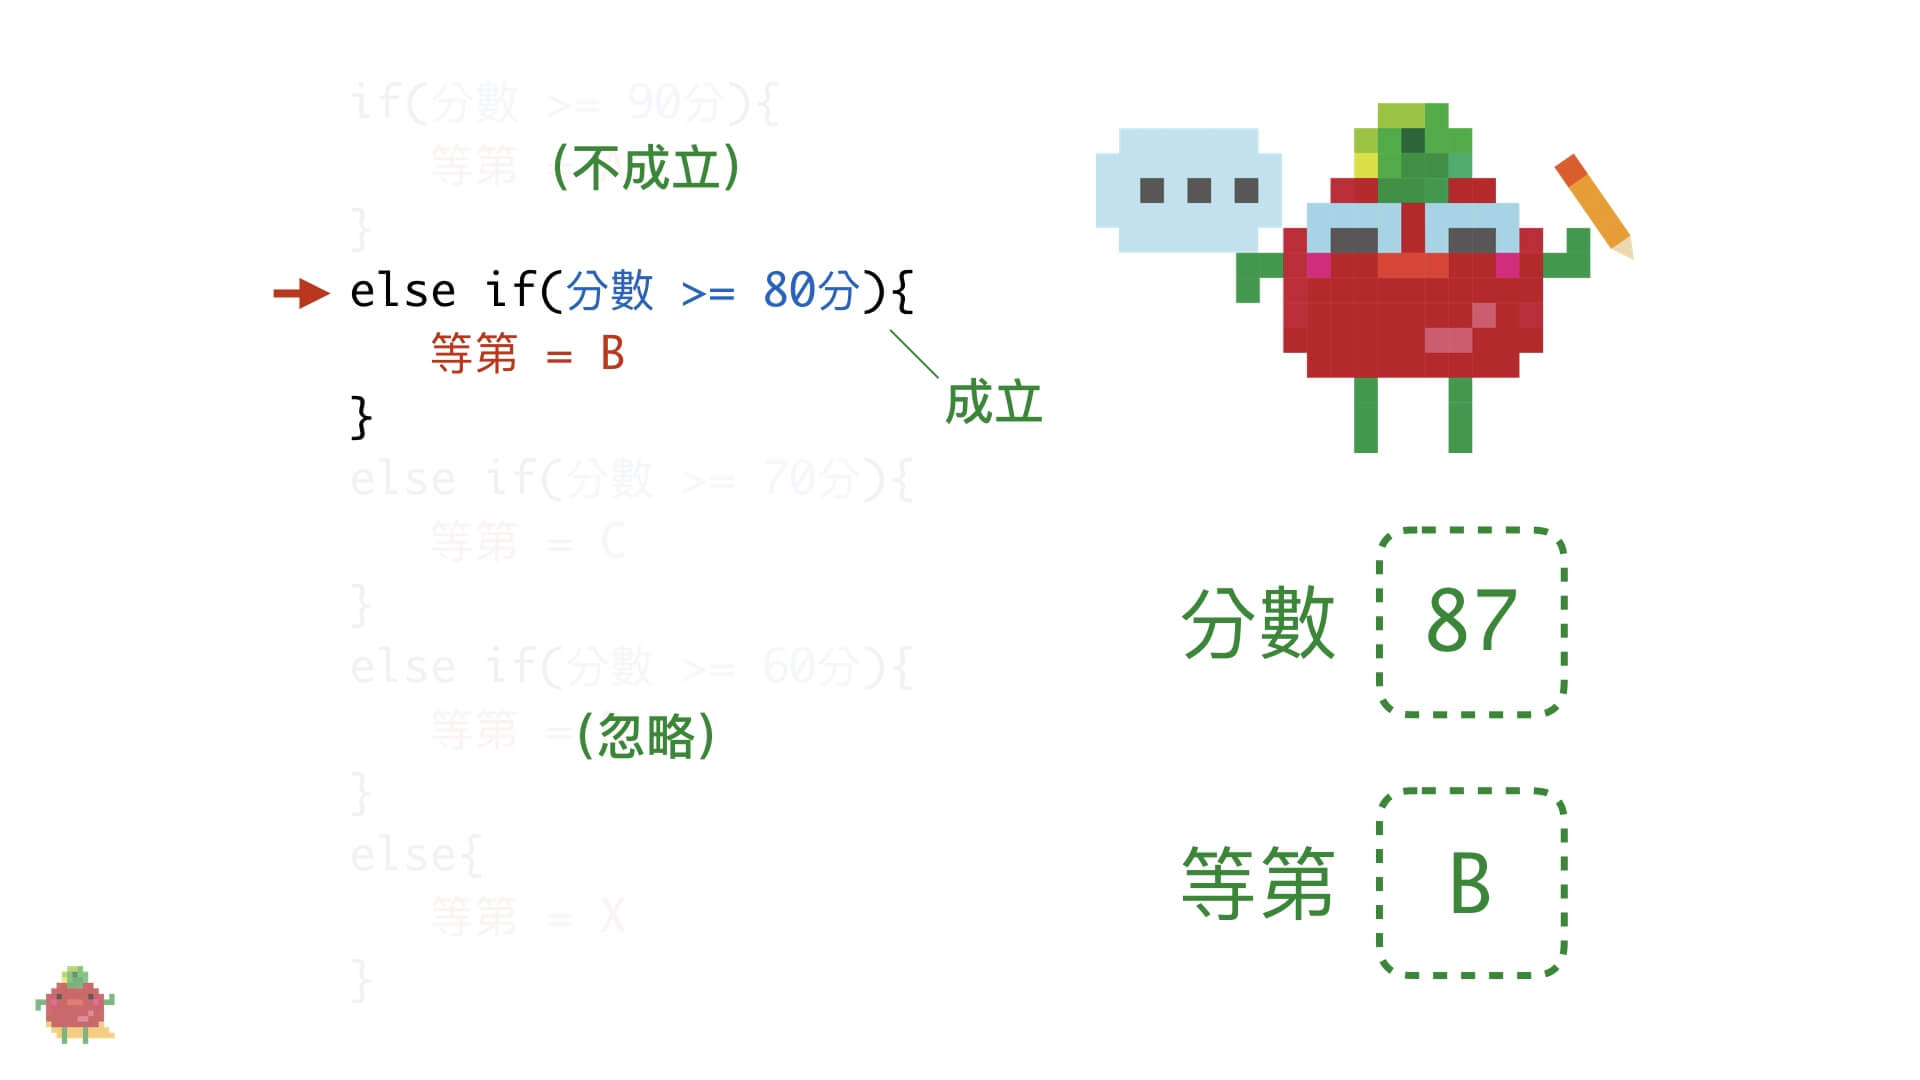 Arduino #4 - 判斷式 if else 讓你操縱自如! - LazyTomato Lab